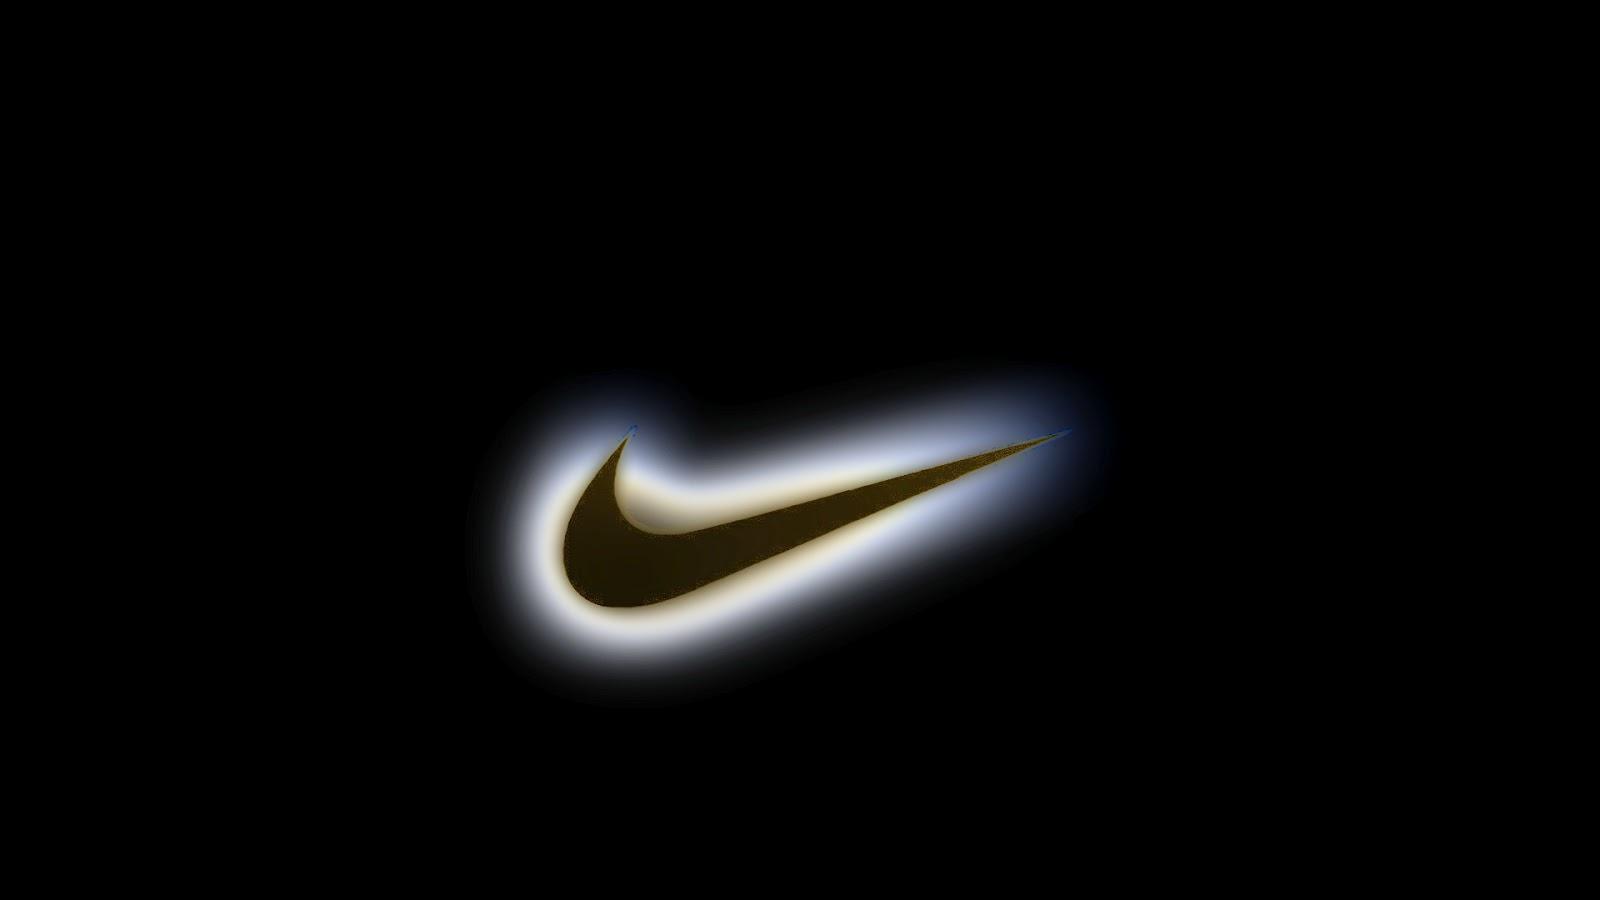 Nike Wallpaper Solar Flare 1600x900